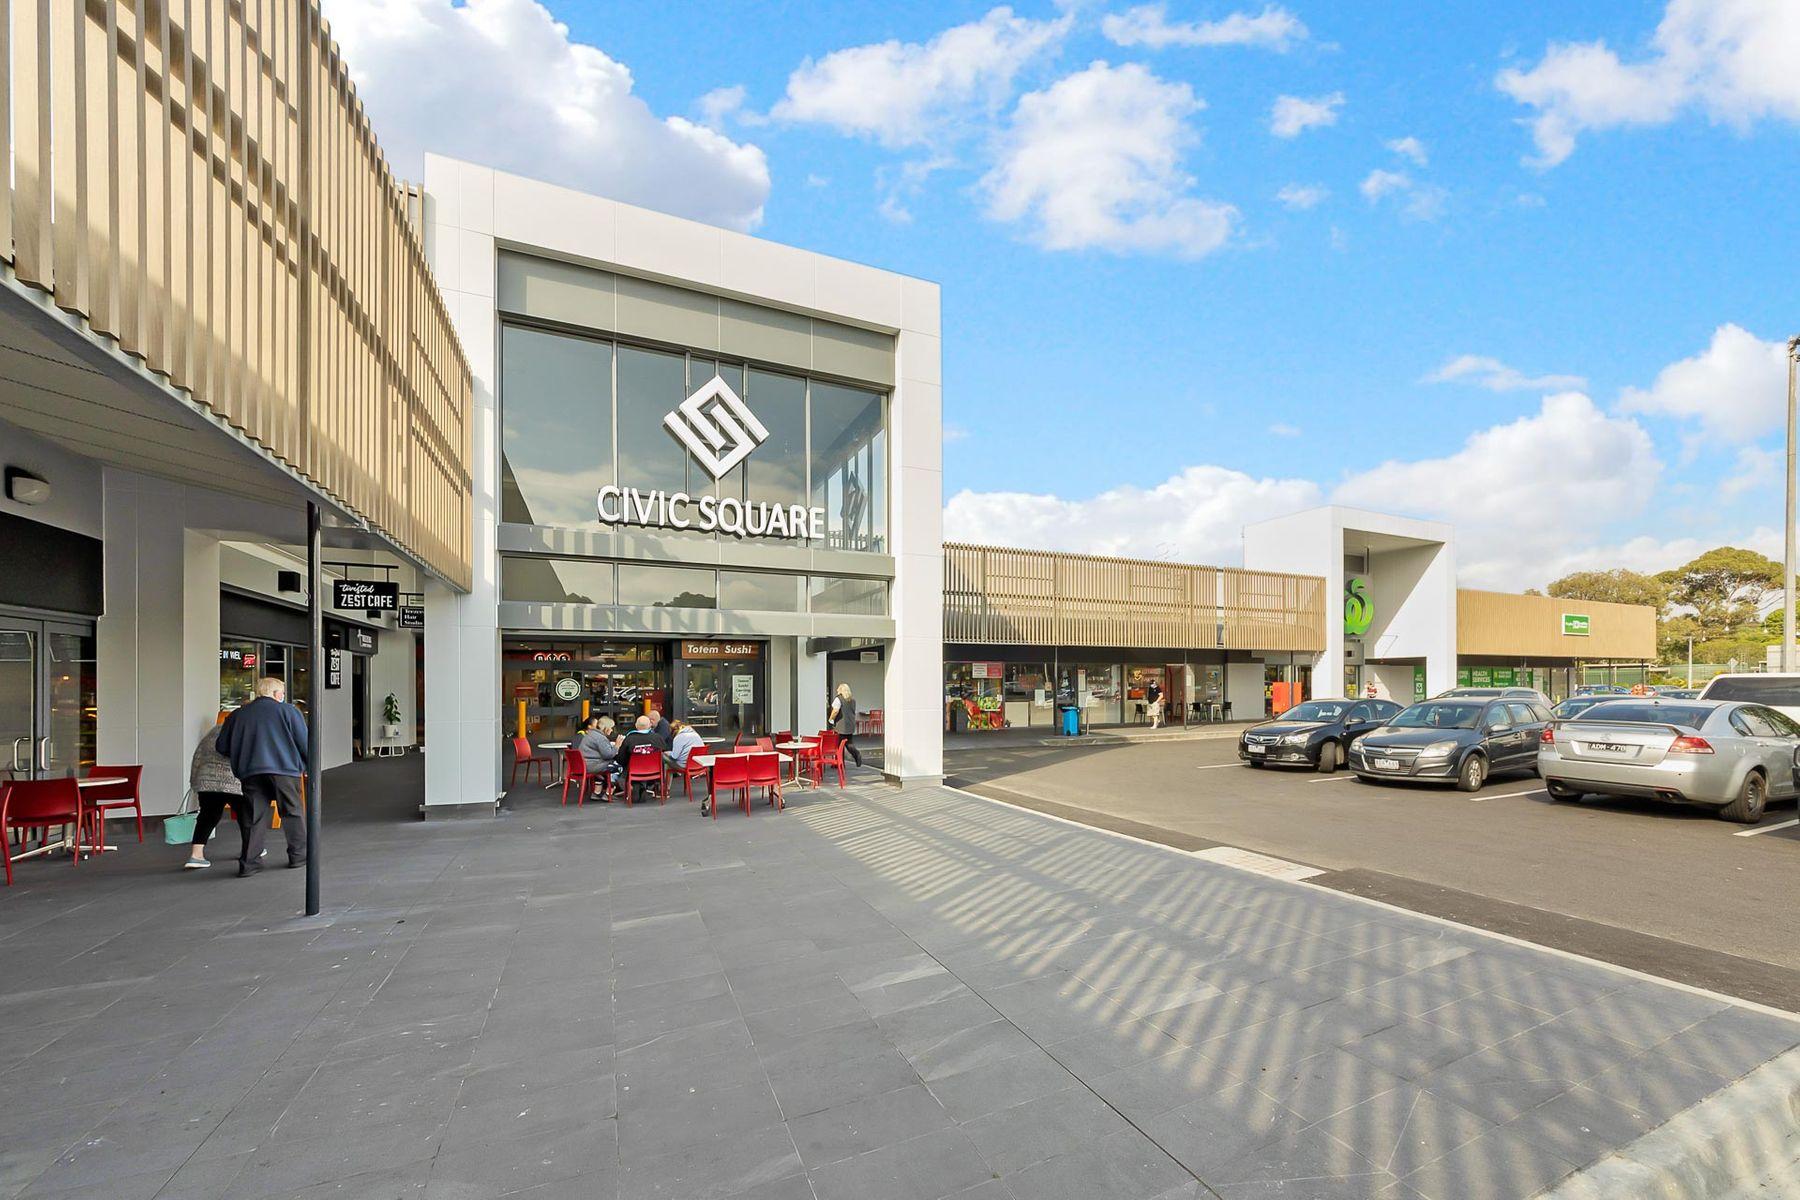 WEB   Shop 2 Civic Square Croydon    8